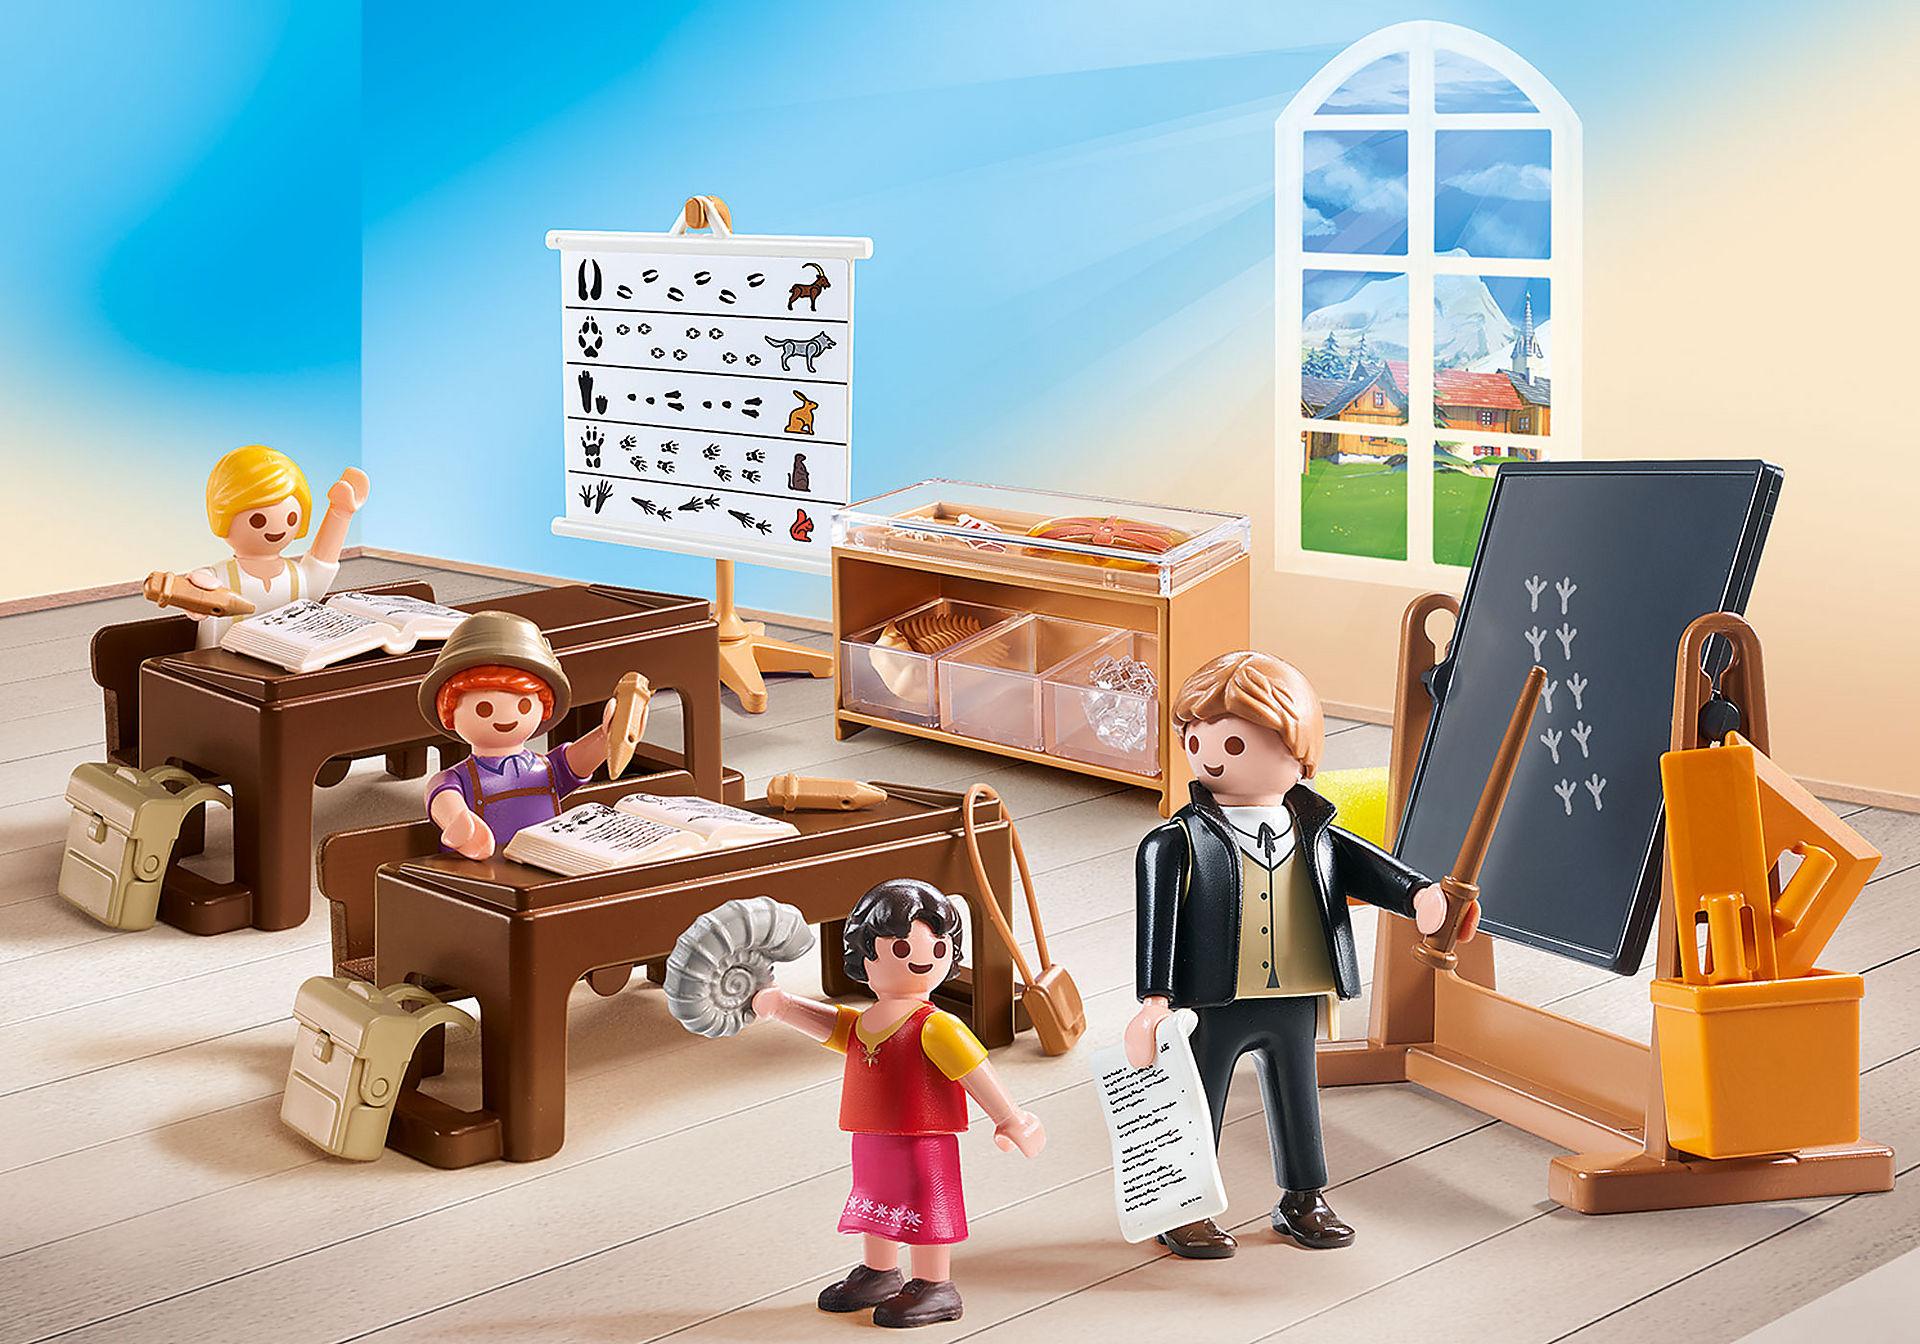 70256 Classroom zoom image1